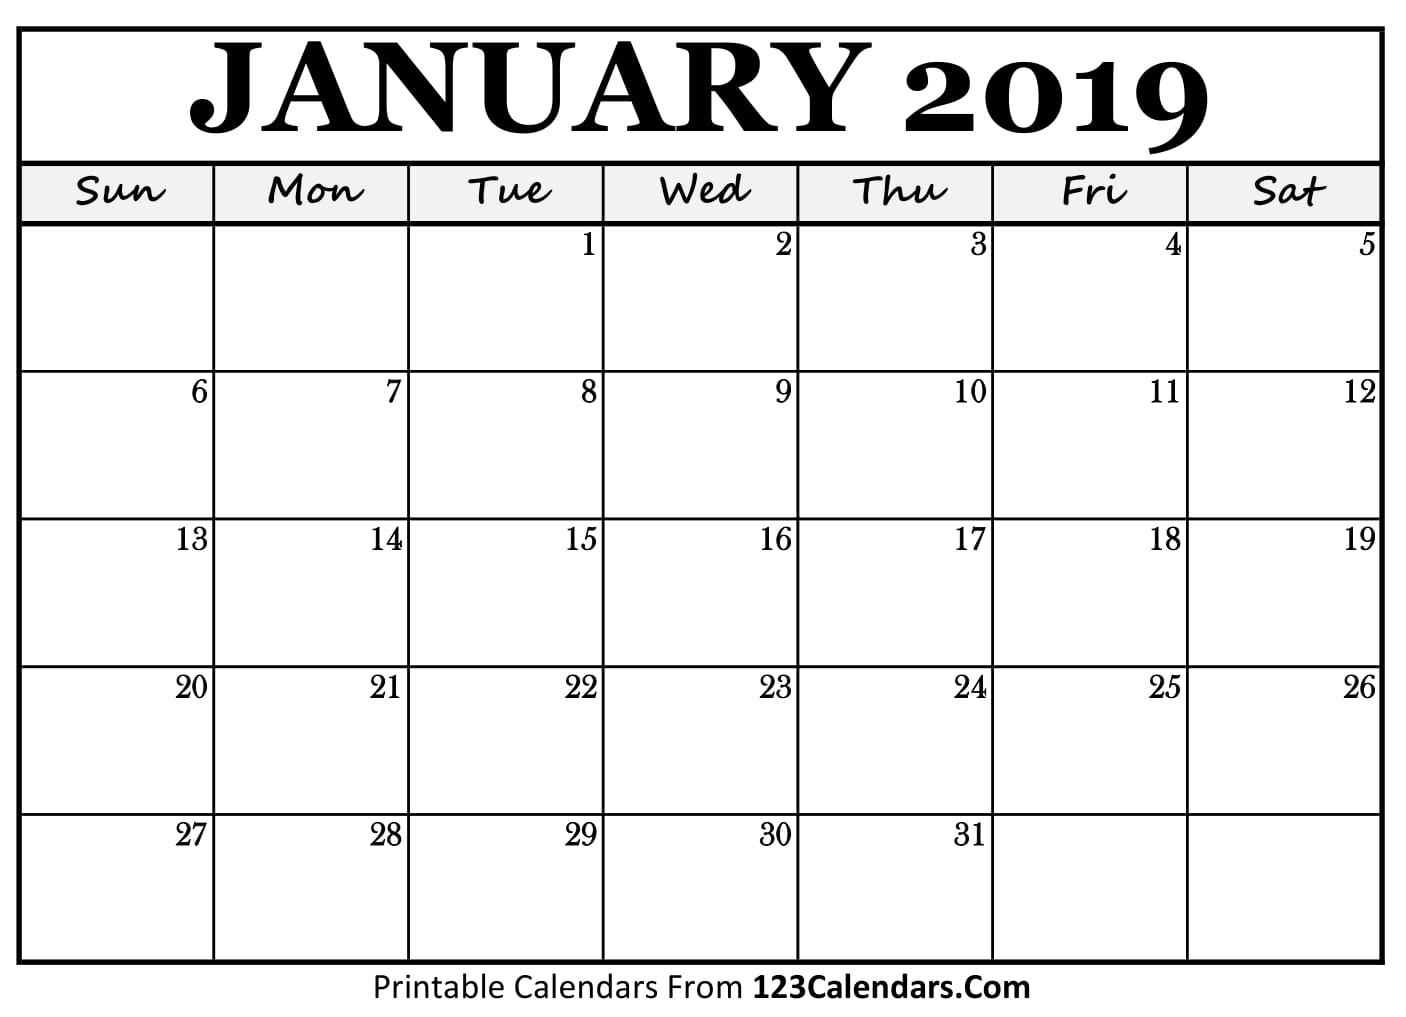 Free Printable Calendar | 123Calendars for Fill In Blank Calendar